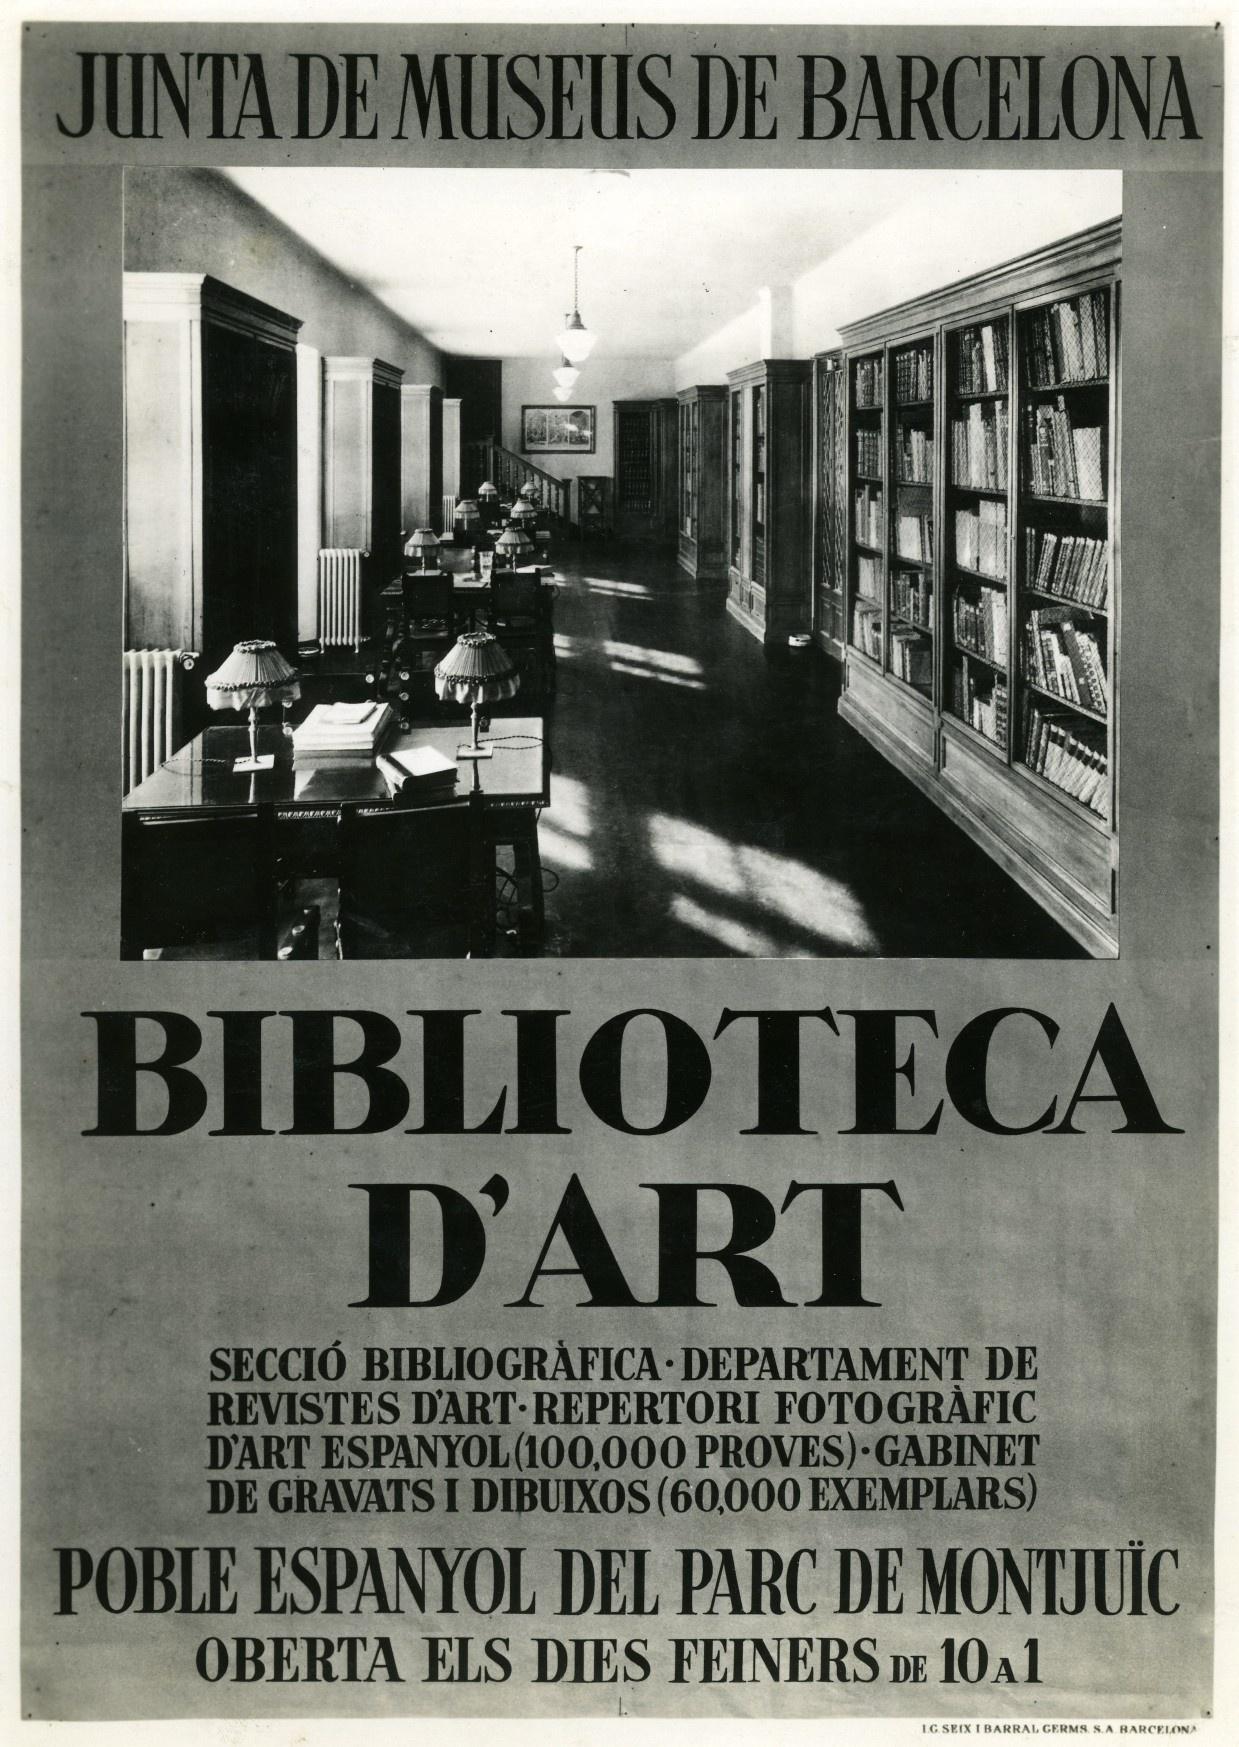 Cartell-anunci de la Biblioteca d'Art